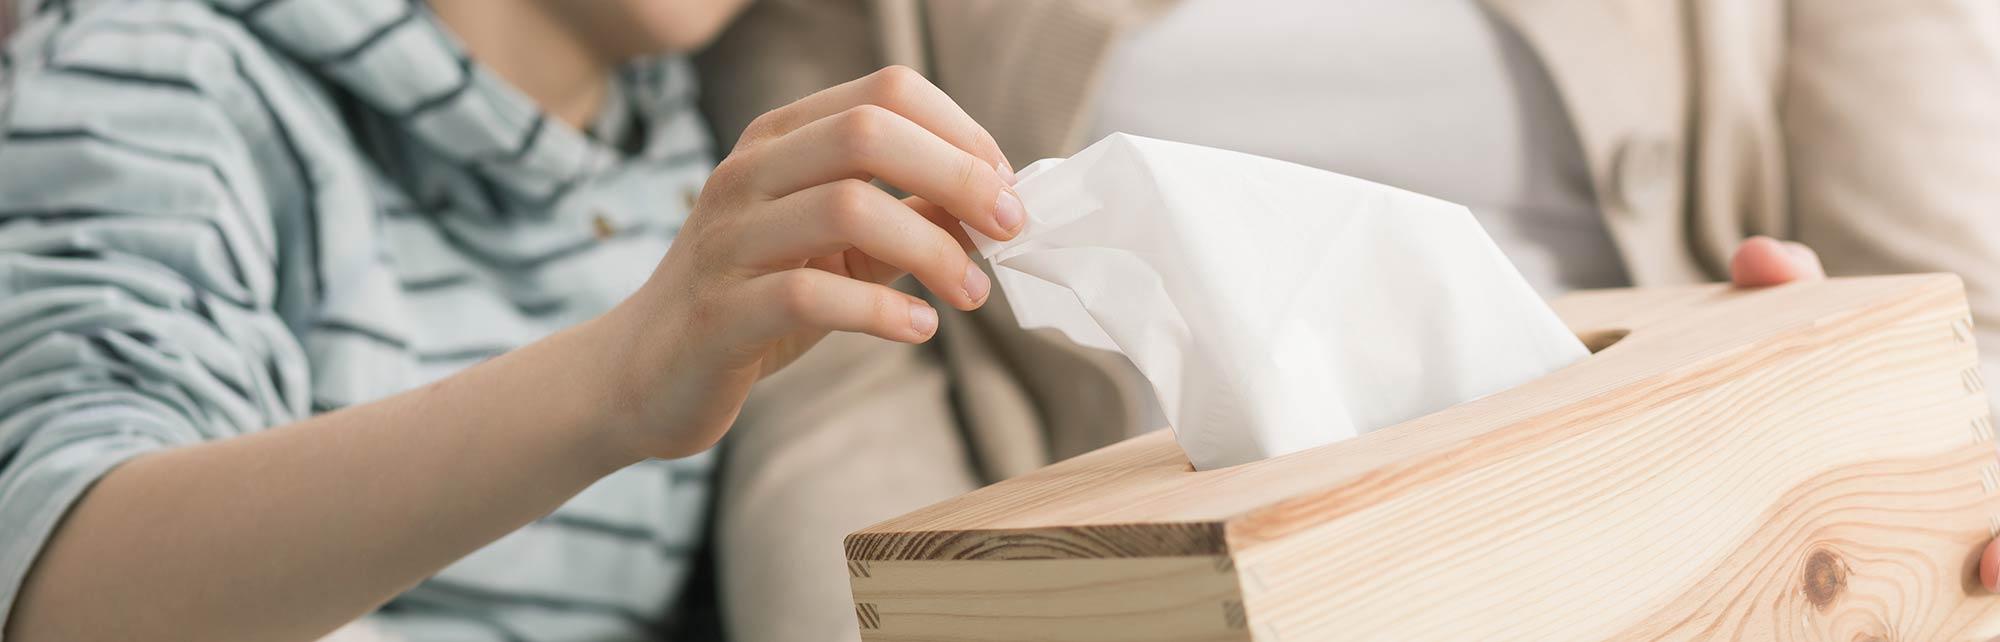 Allergy Testing photo